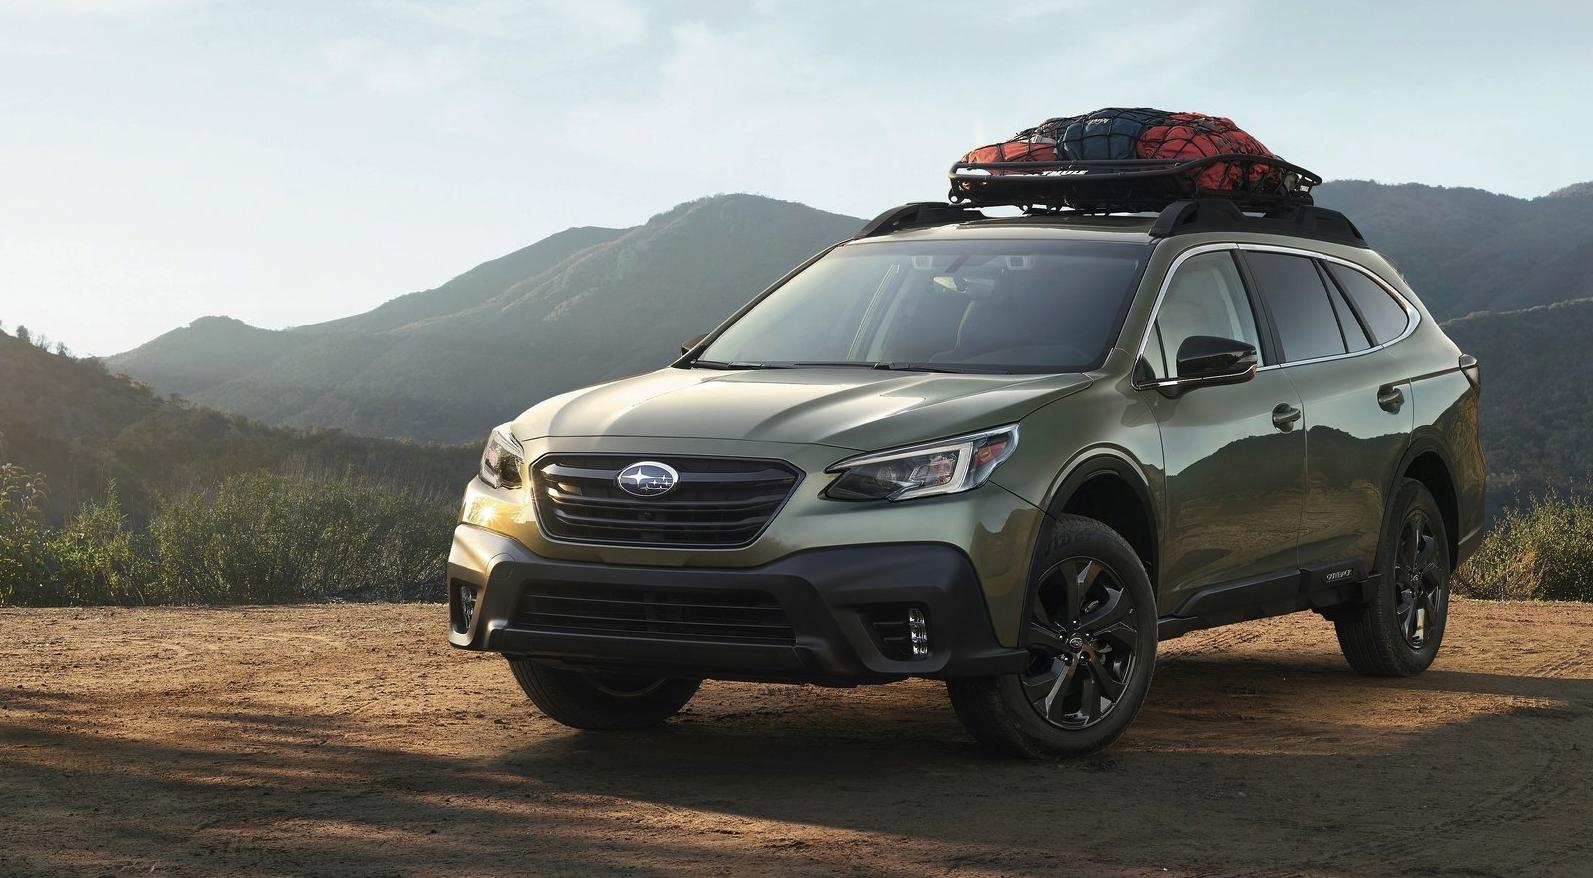 Subaru des Sources | The 2020 Subaru Outback Returns with